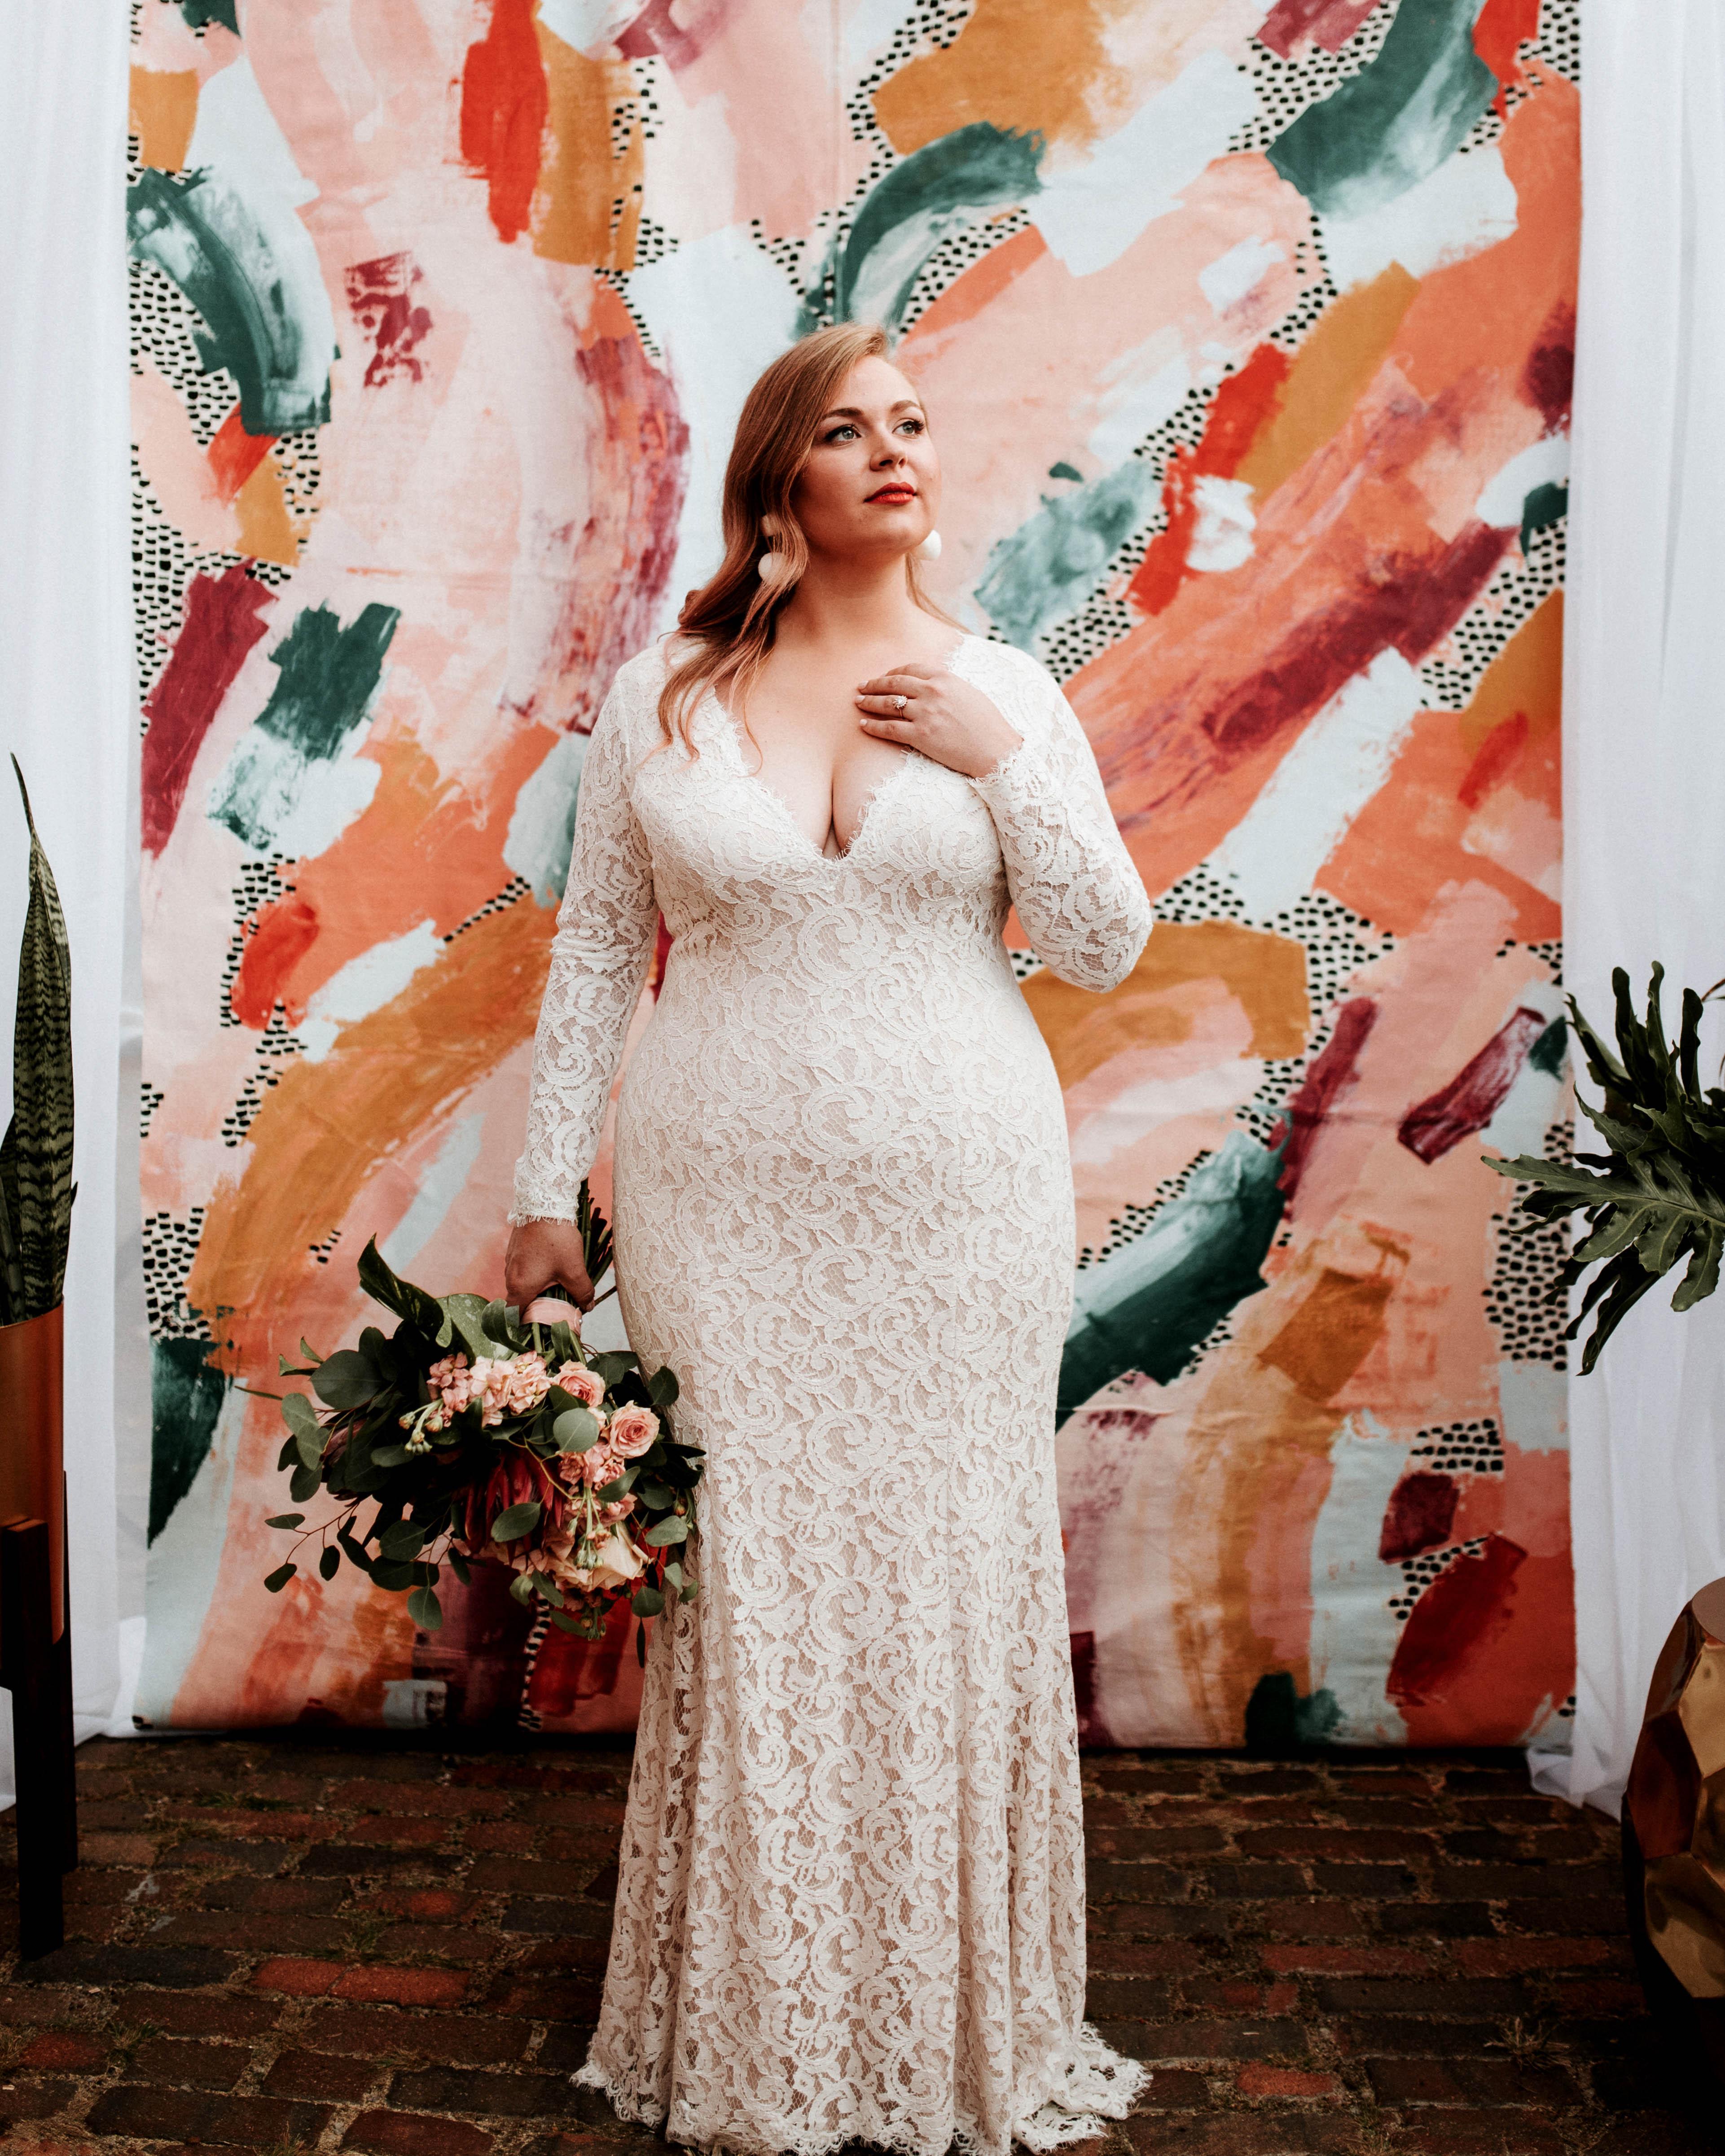 long sleeved wedding lace dress